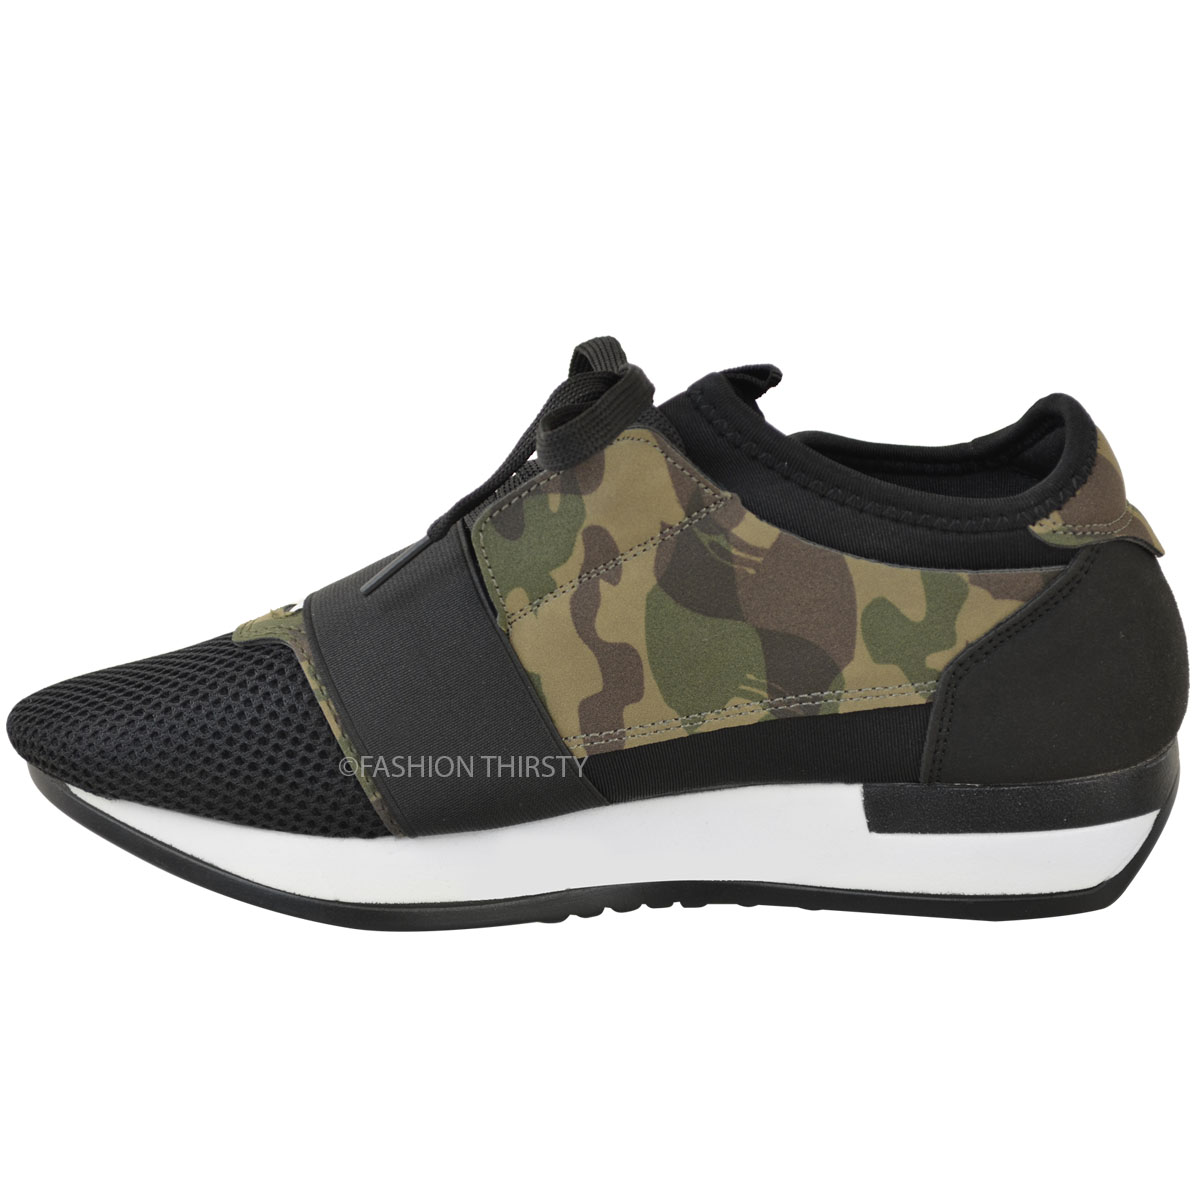 Fashion Thirsty Shoes